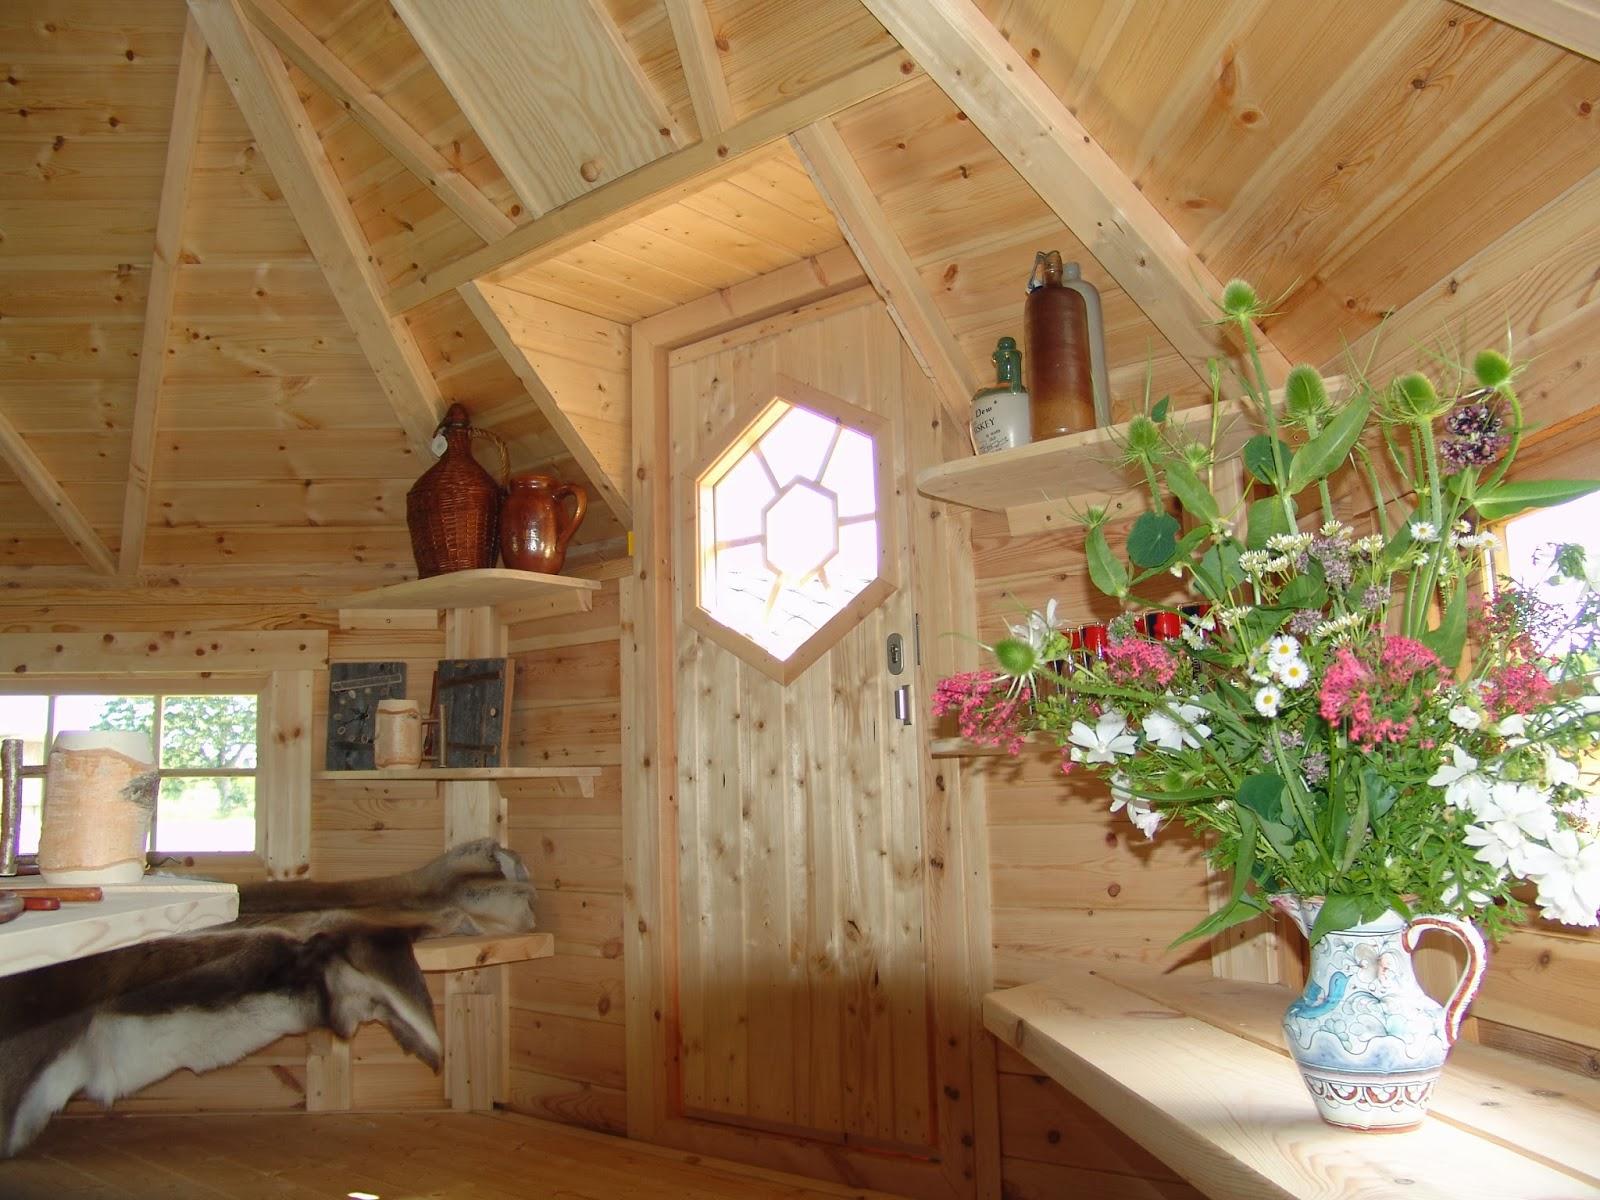 meiselbach mobilheime kota die grillzeit beginnt heute. Black Bedroom Furniture Sets. Home Design Ideas